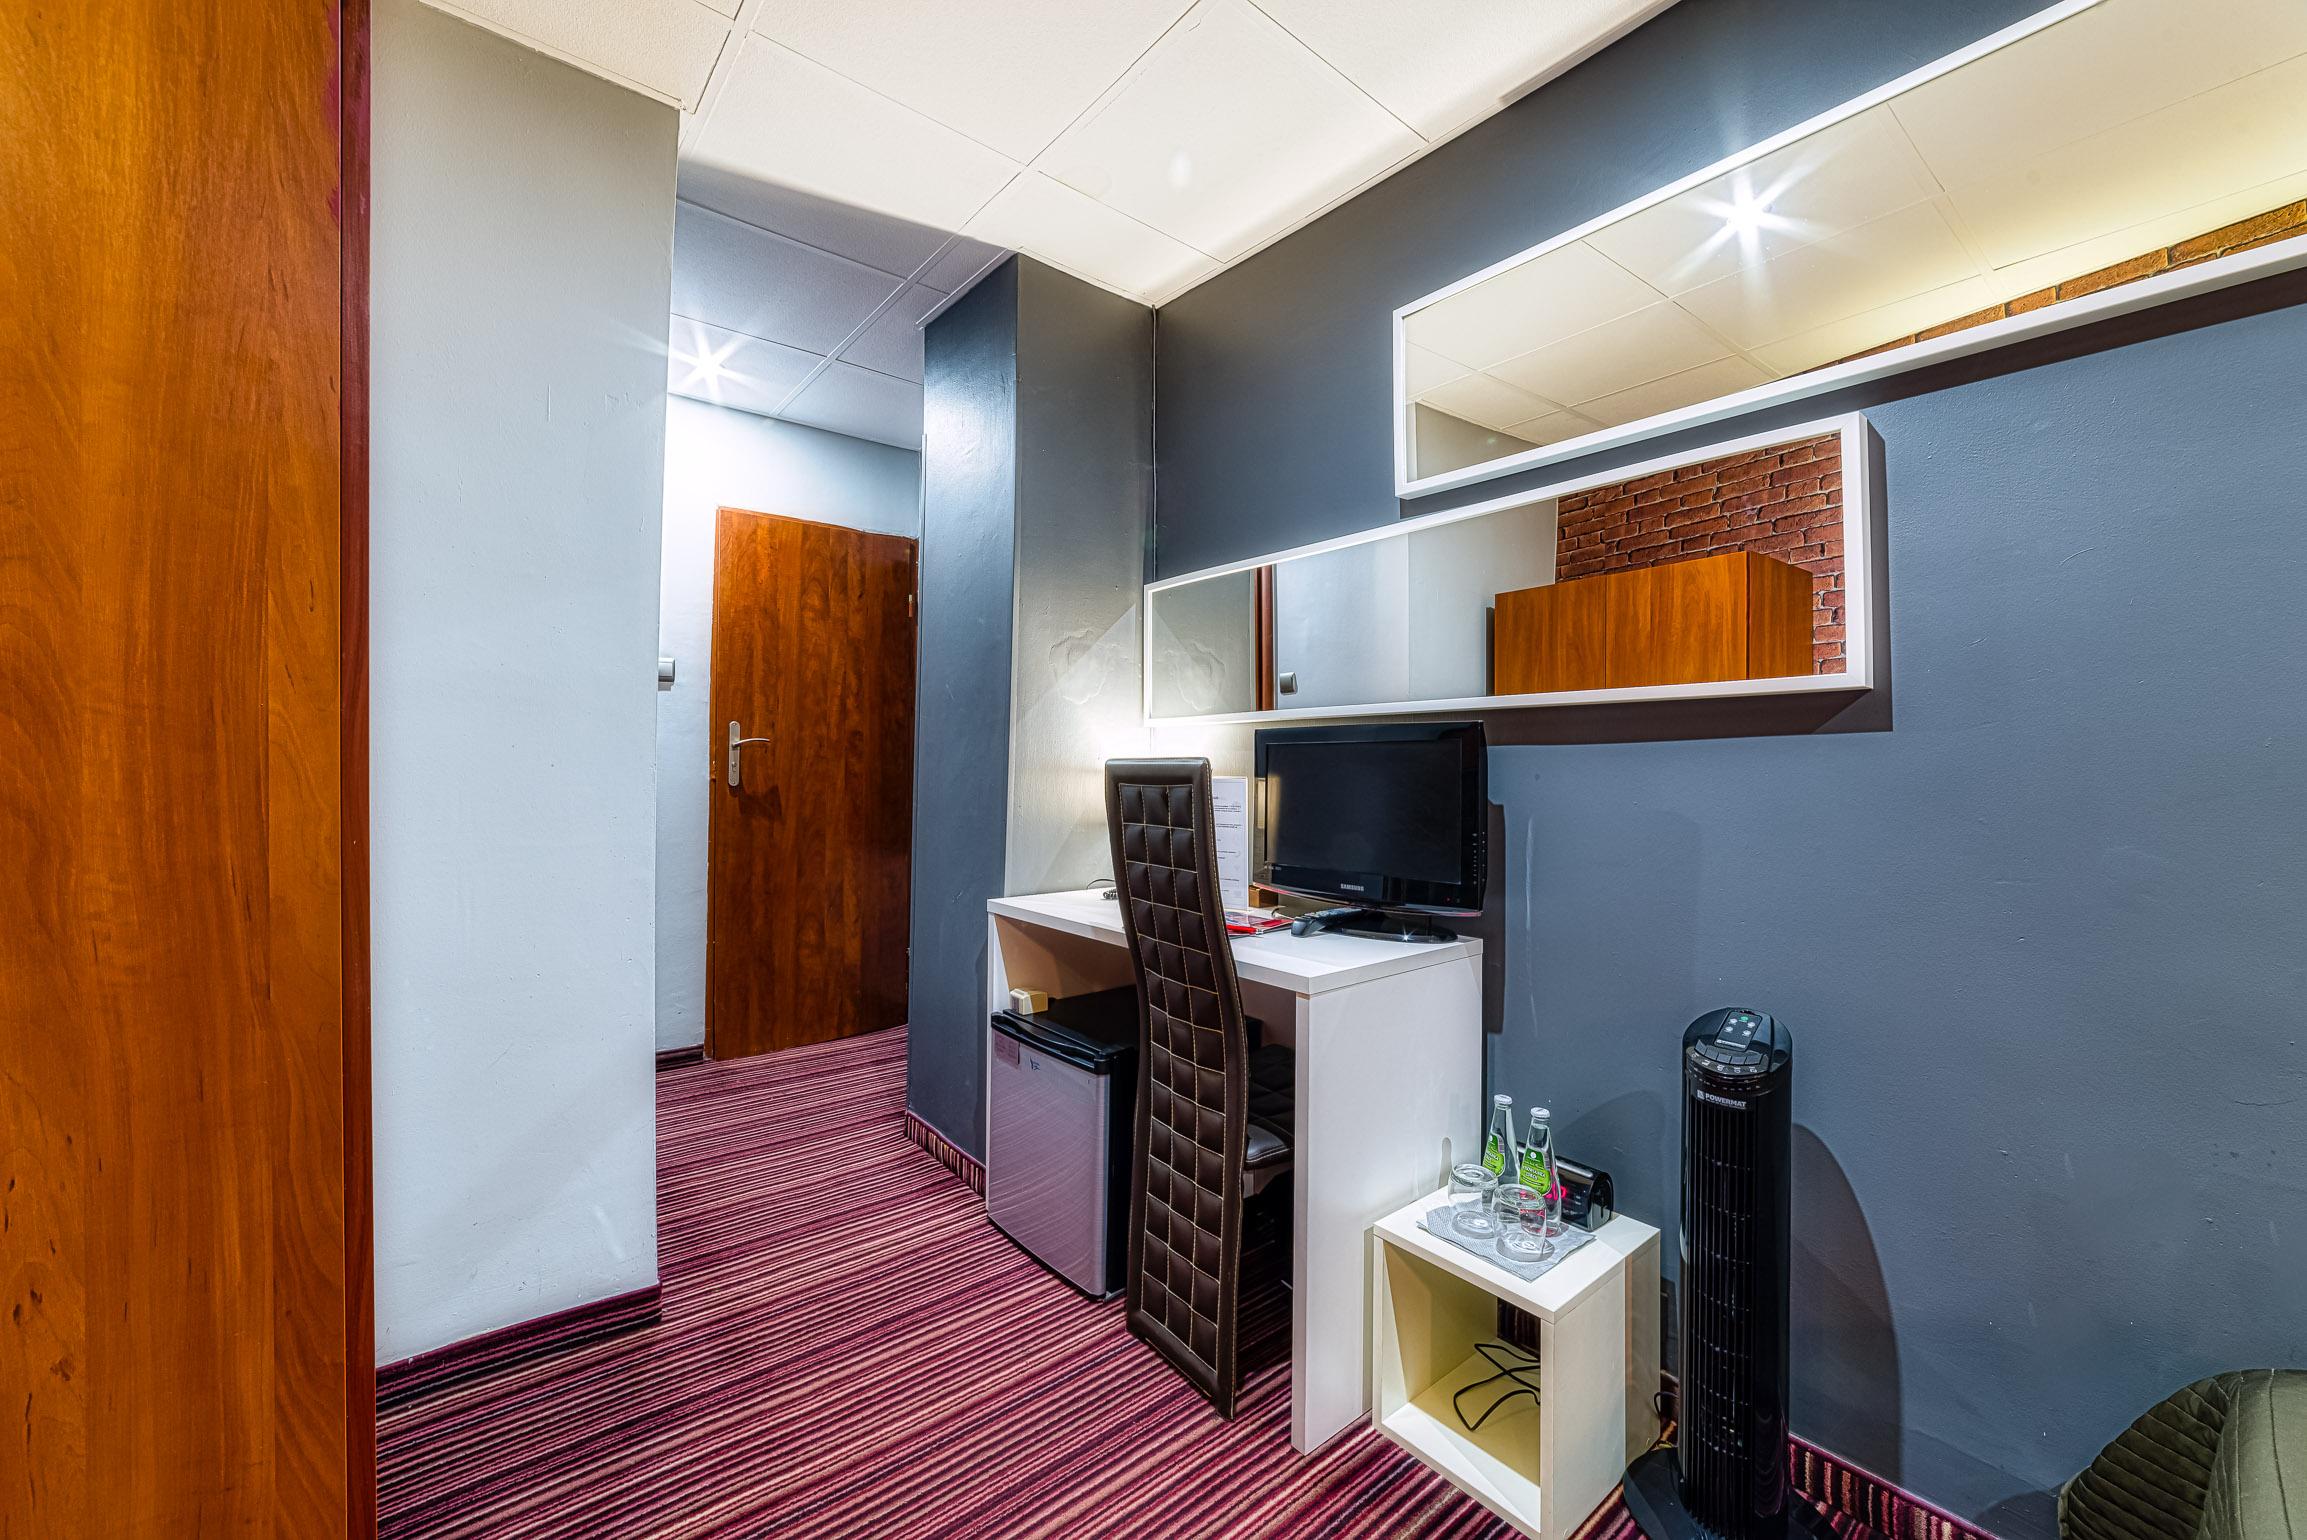 Eco room 9